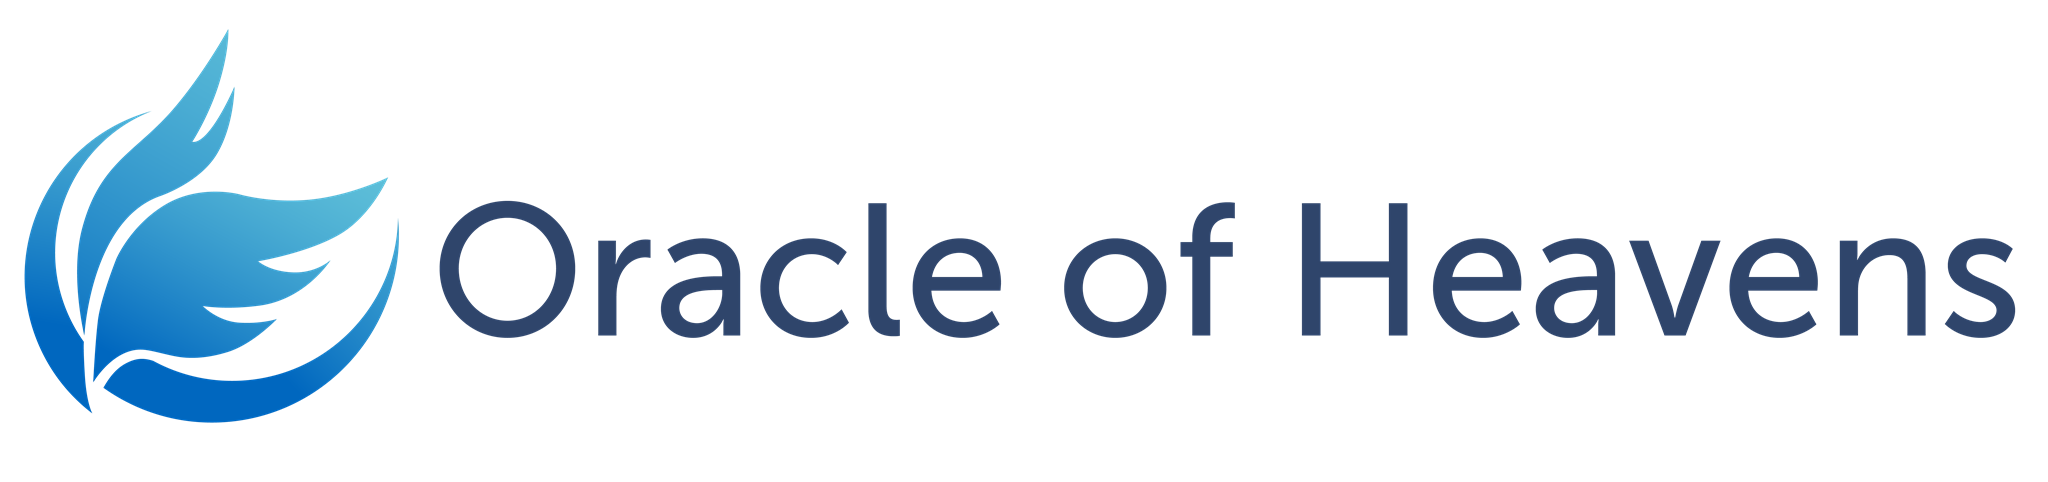 Oracleofheavens.com Coupons & Promo codes